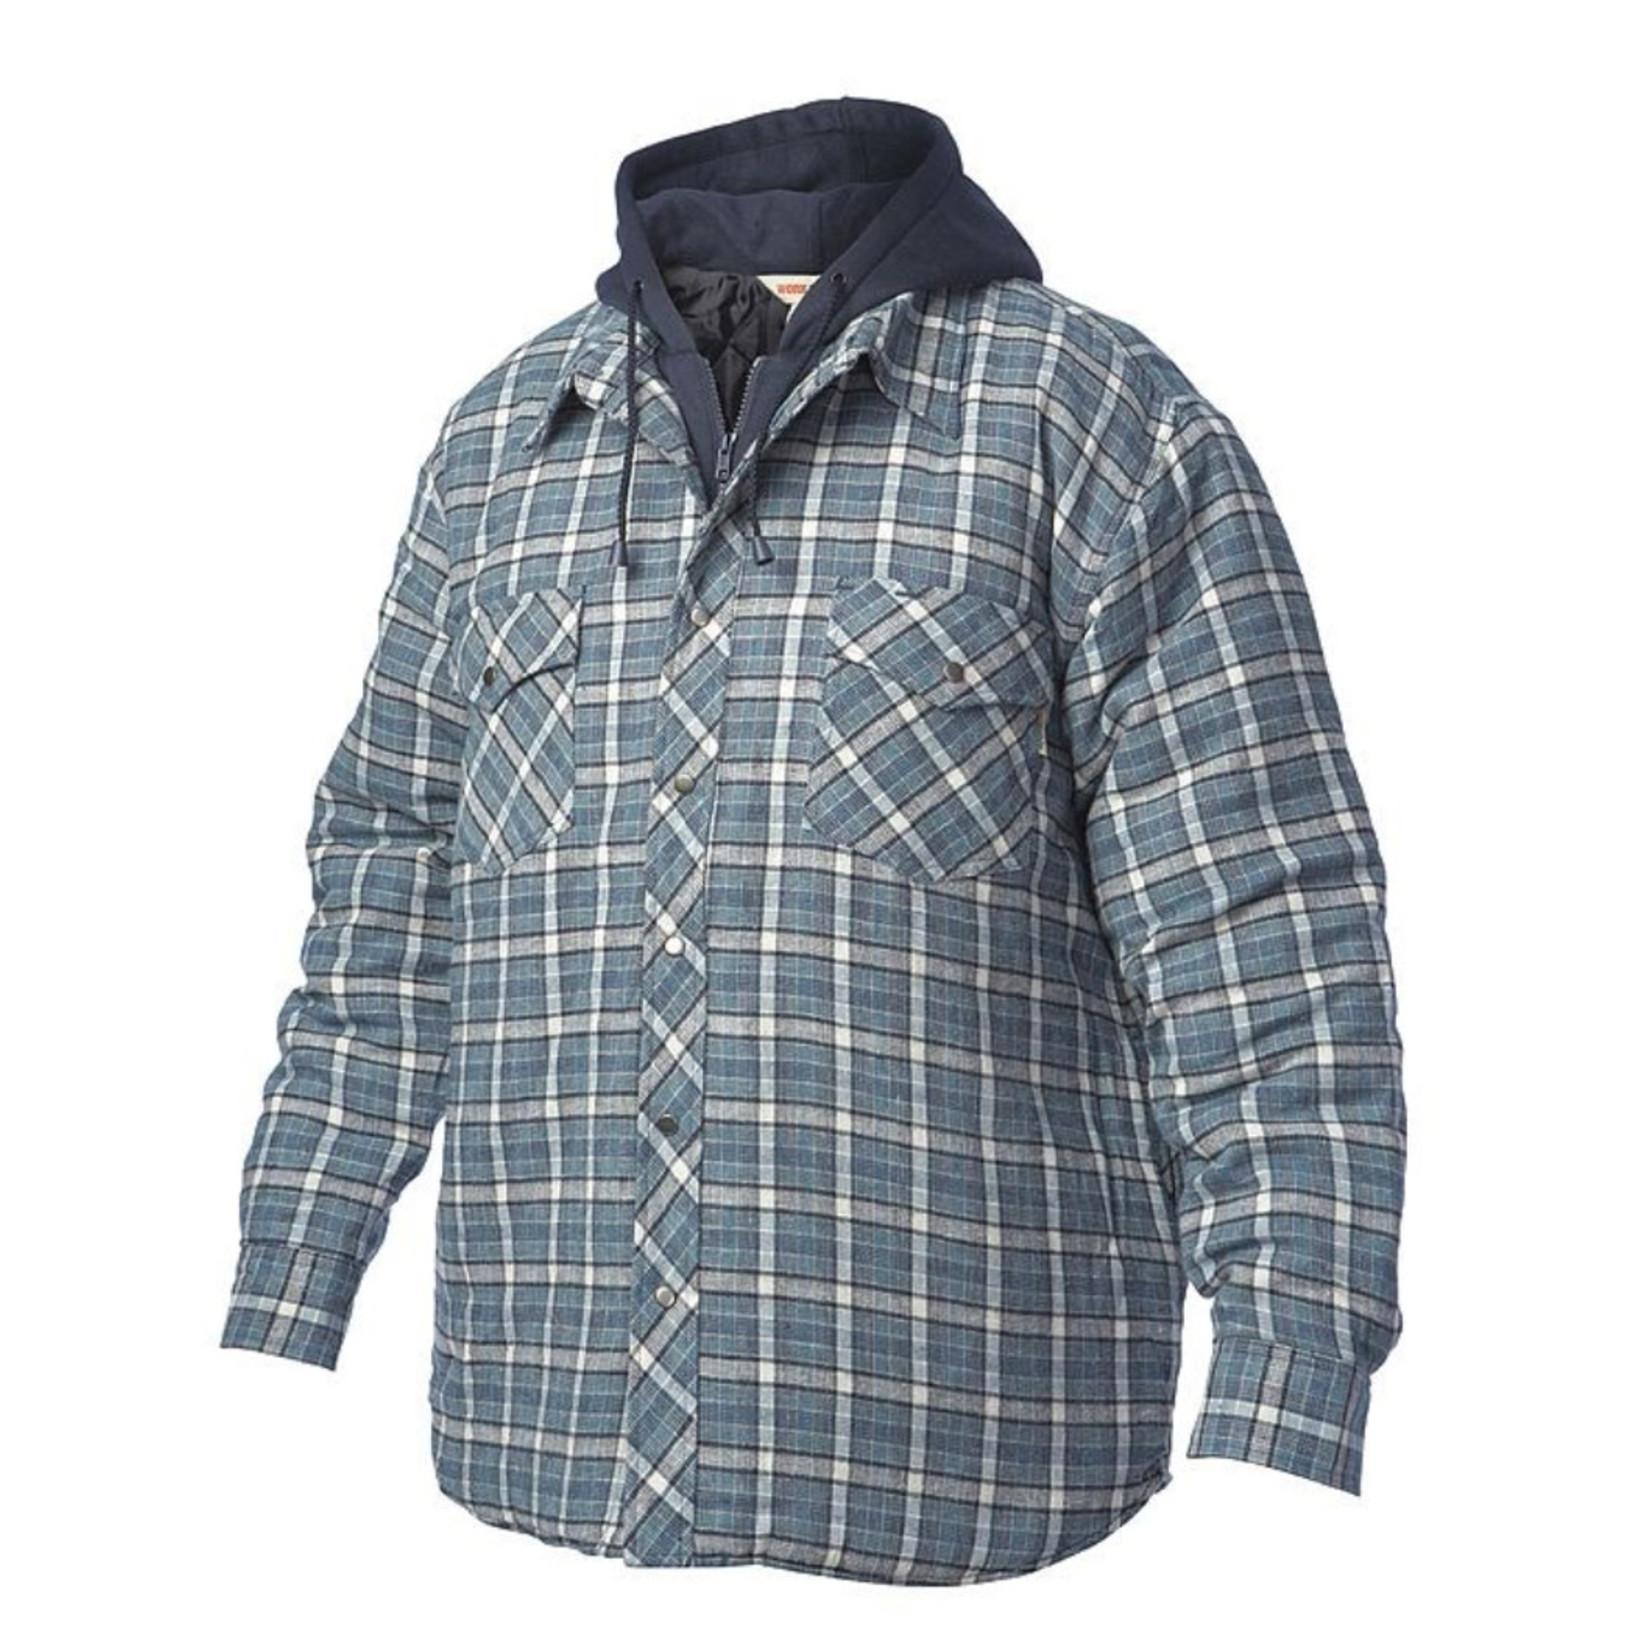 Work King Work King Men's Fooler Hooded Flannel Jack Shirt Quilted Liner Zipper and Snaps I6U511